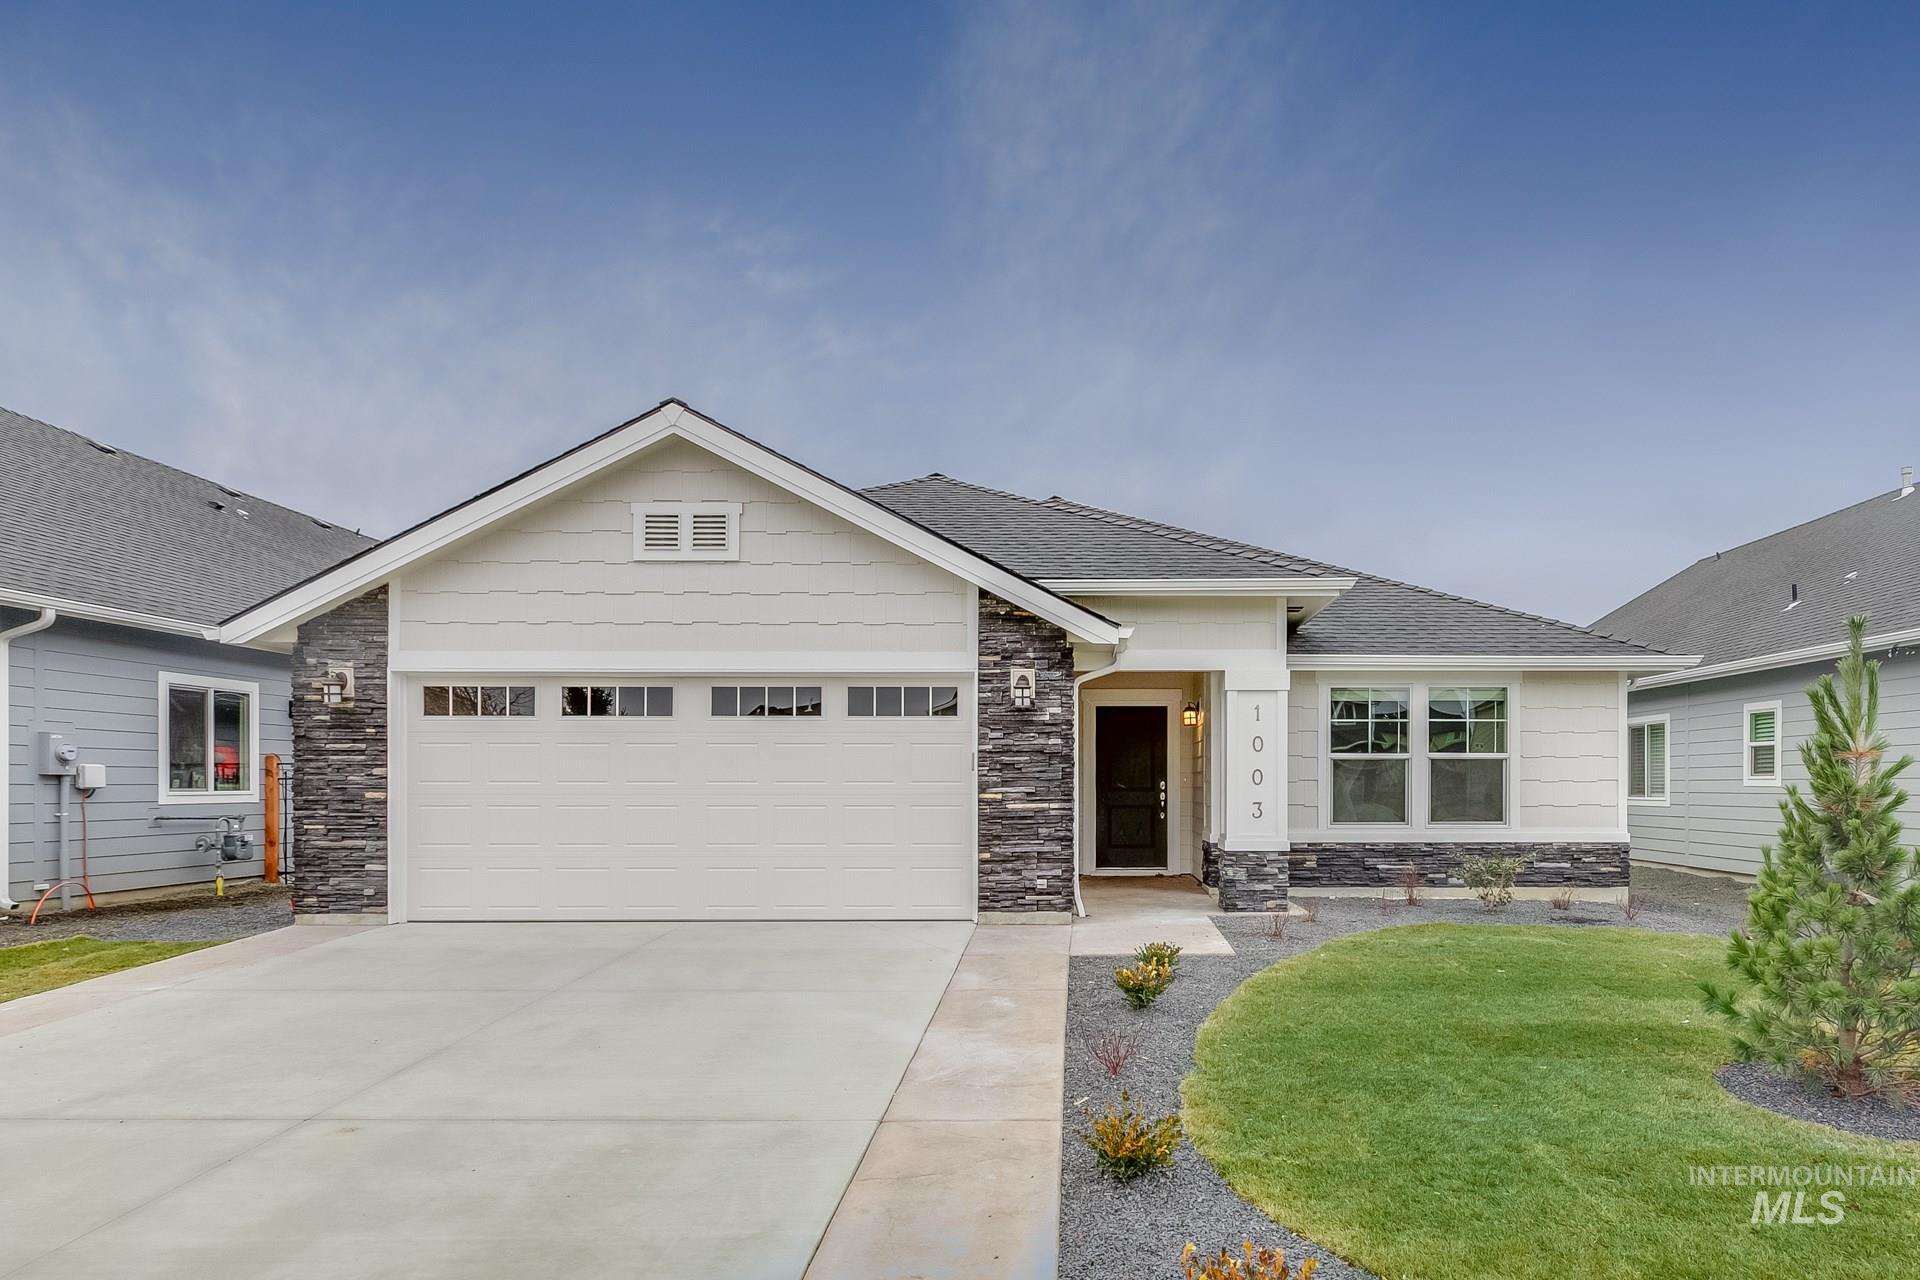 2598 W Balboa Dr Property Photo - Kuna, ID real estate listing